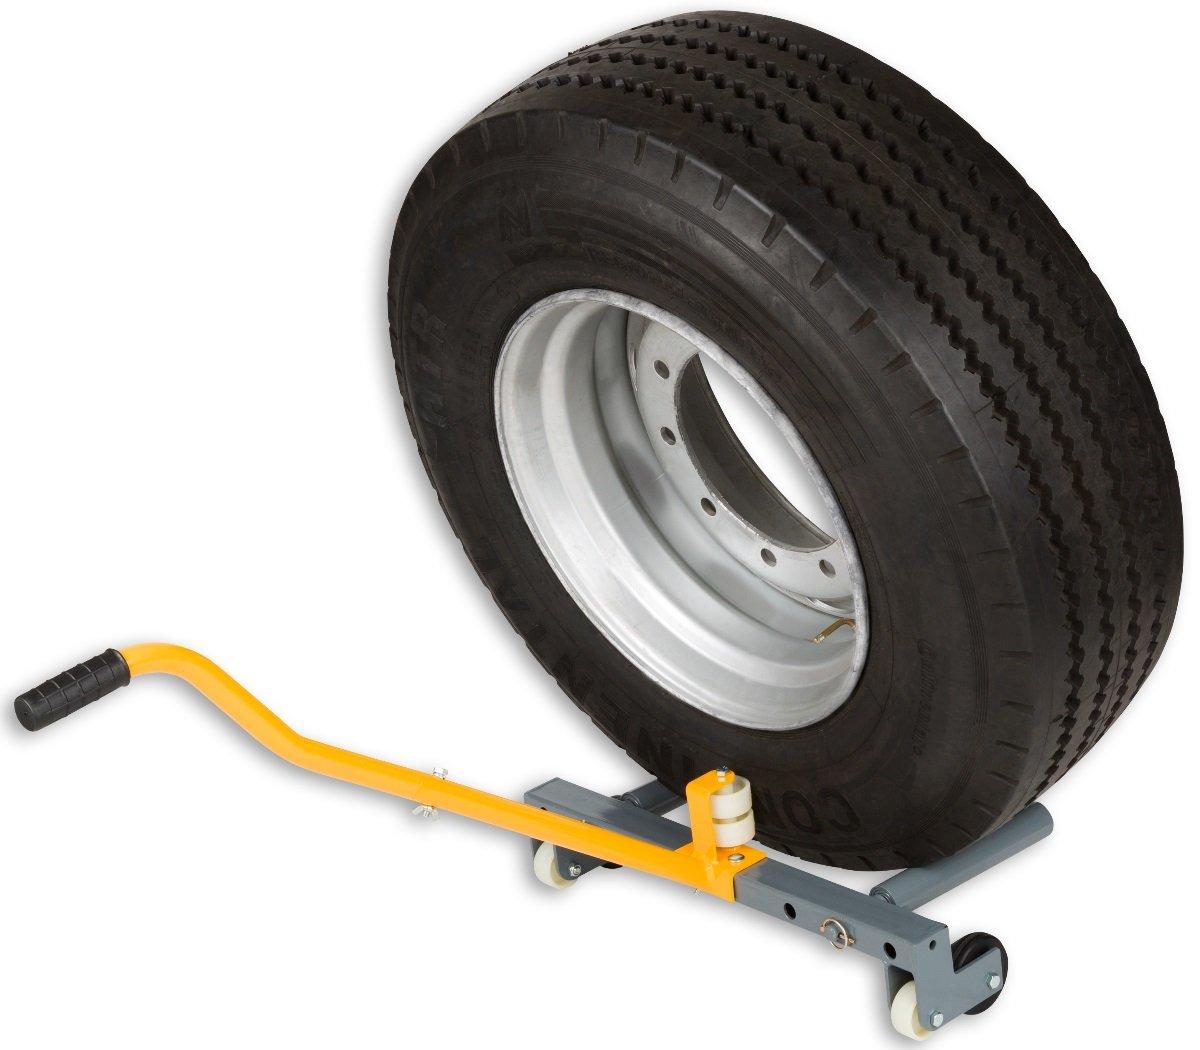 Winntec Truck Wheel Dolly Offers Safe Handling